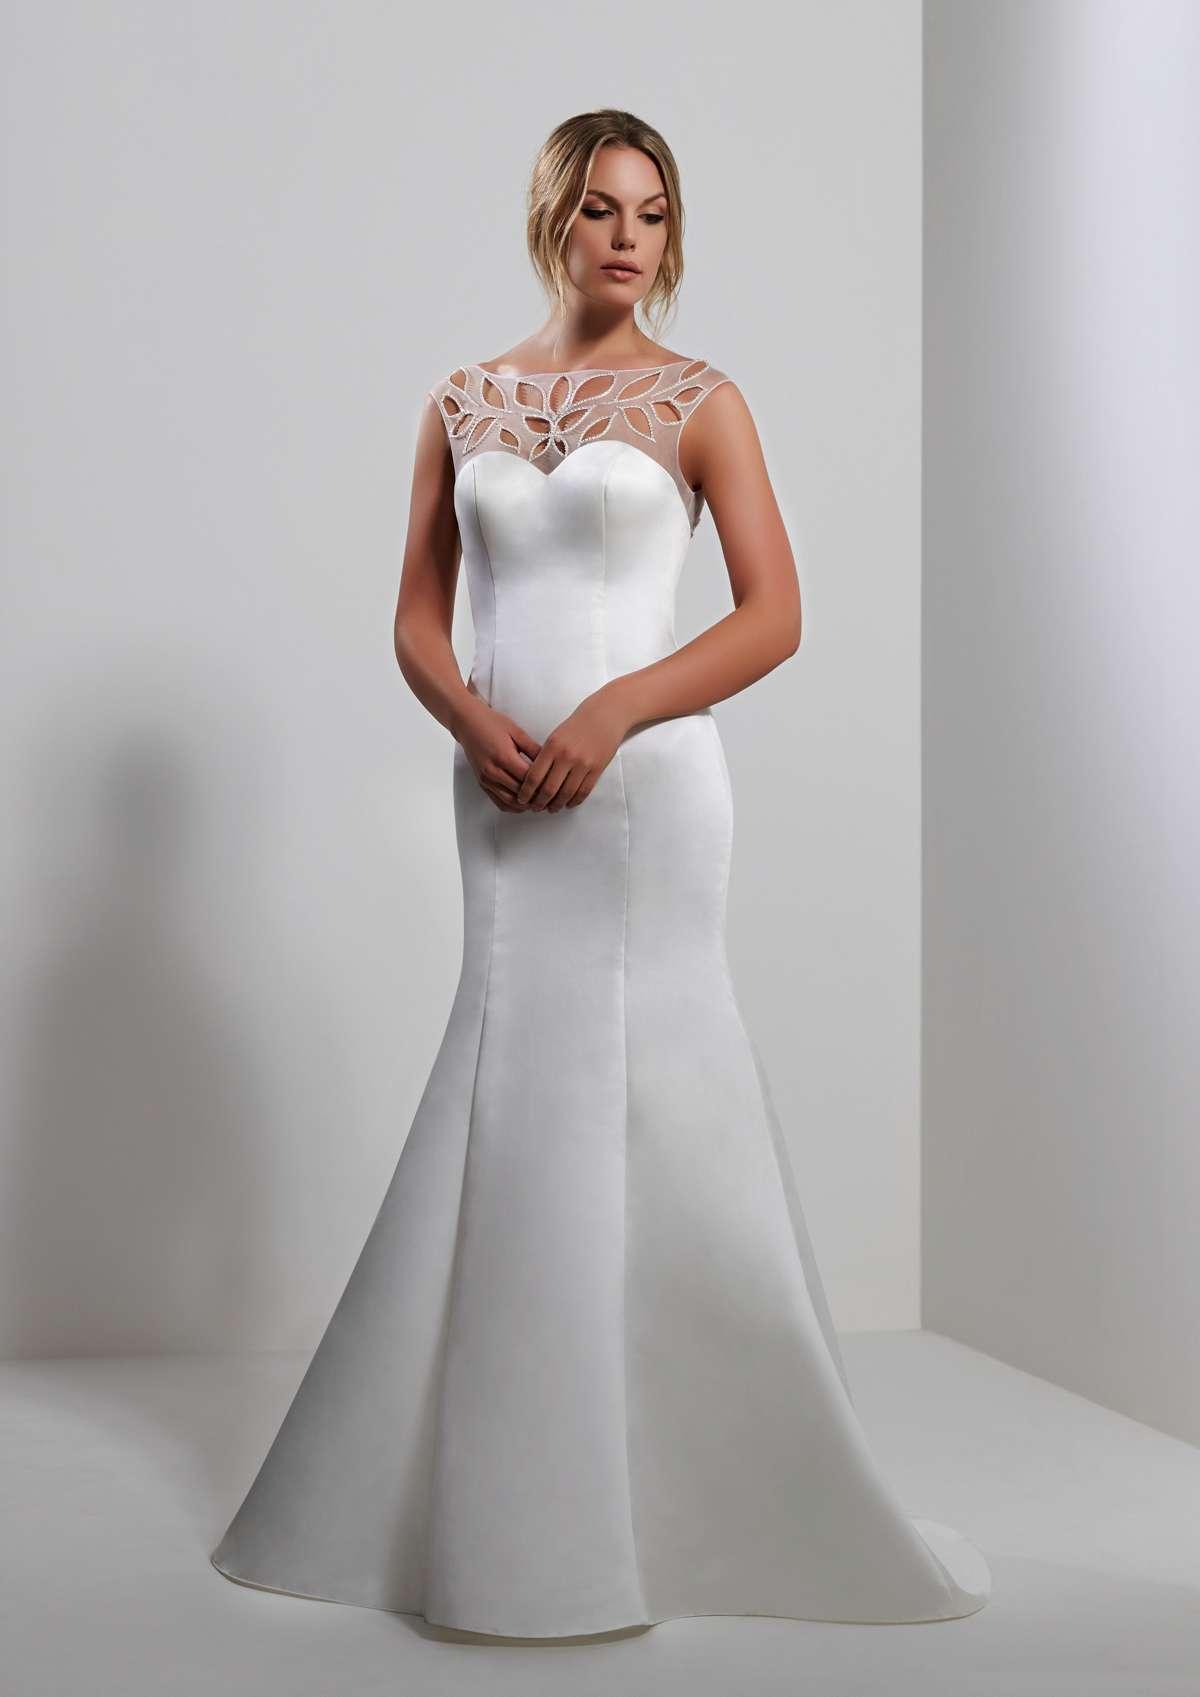 New Wedding Dress Hire Online – Wedding